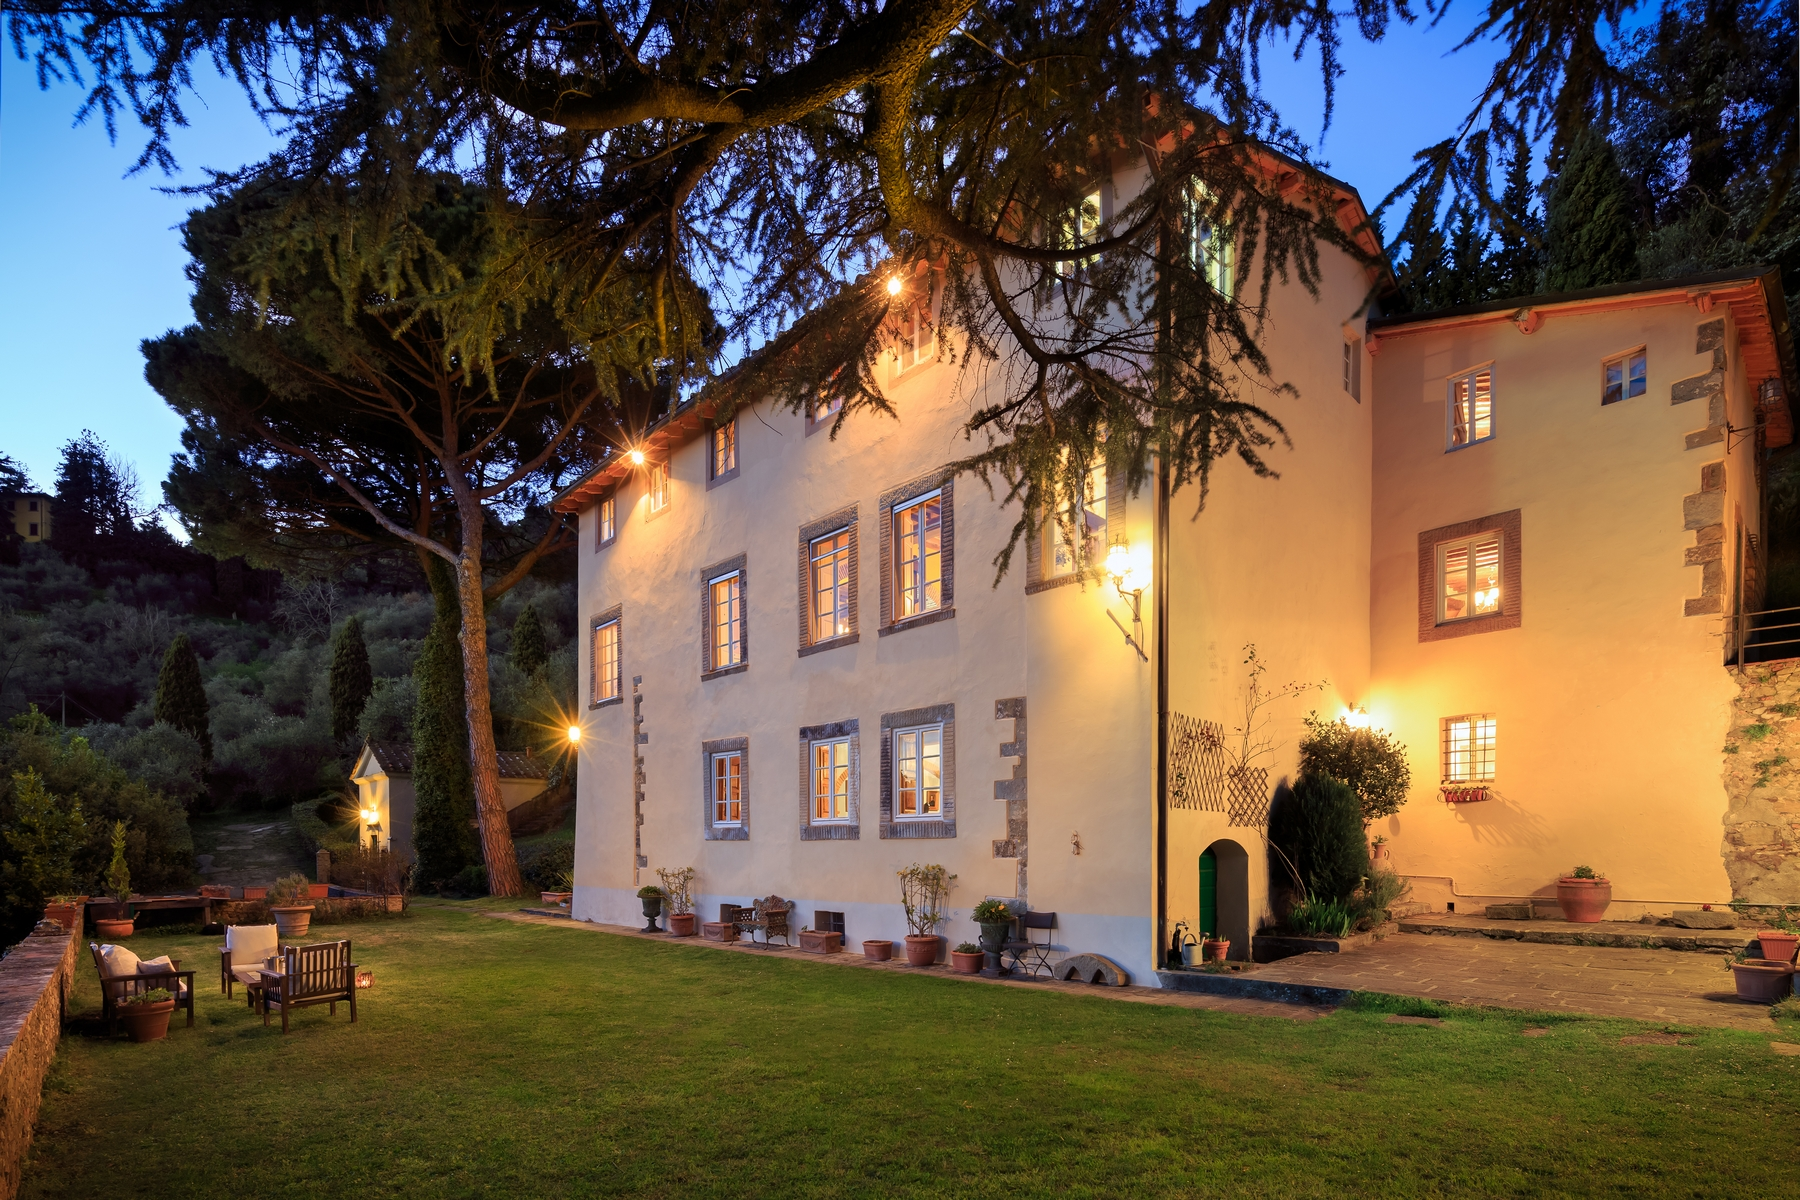 Villa in Vendita a Lucca: 5 locali, 550 mq - Foto 1